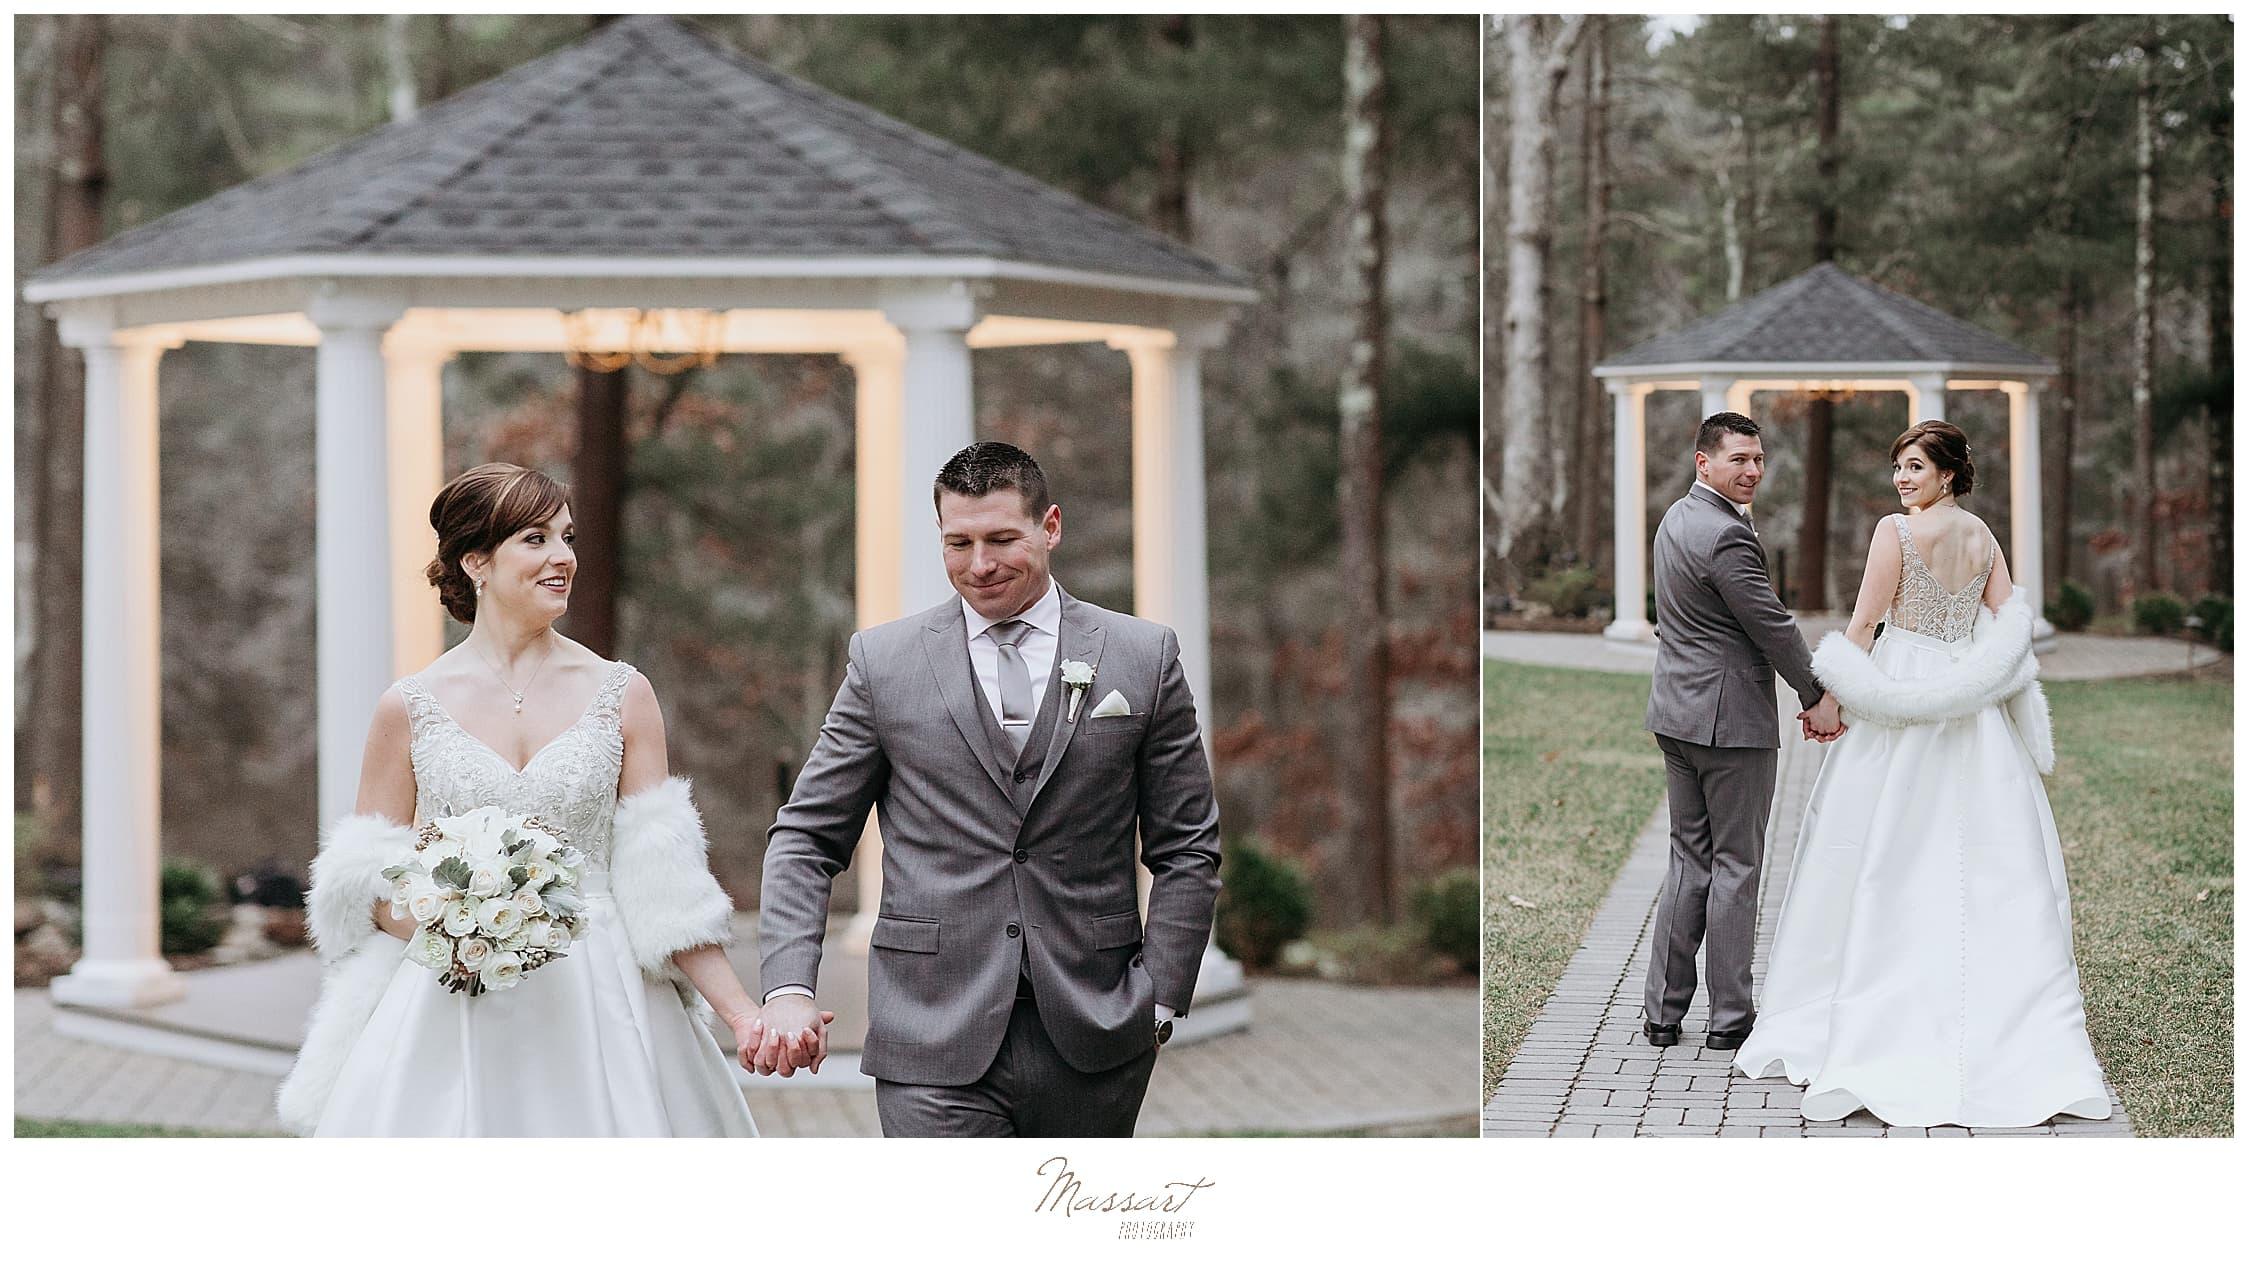 winter wedding portraits at Lakeview Pavilion gazebo by Massart Photography